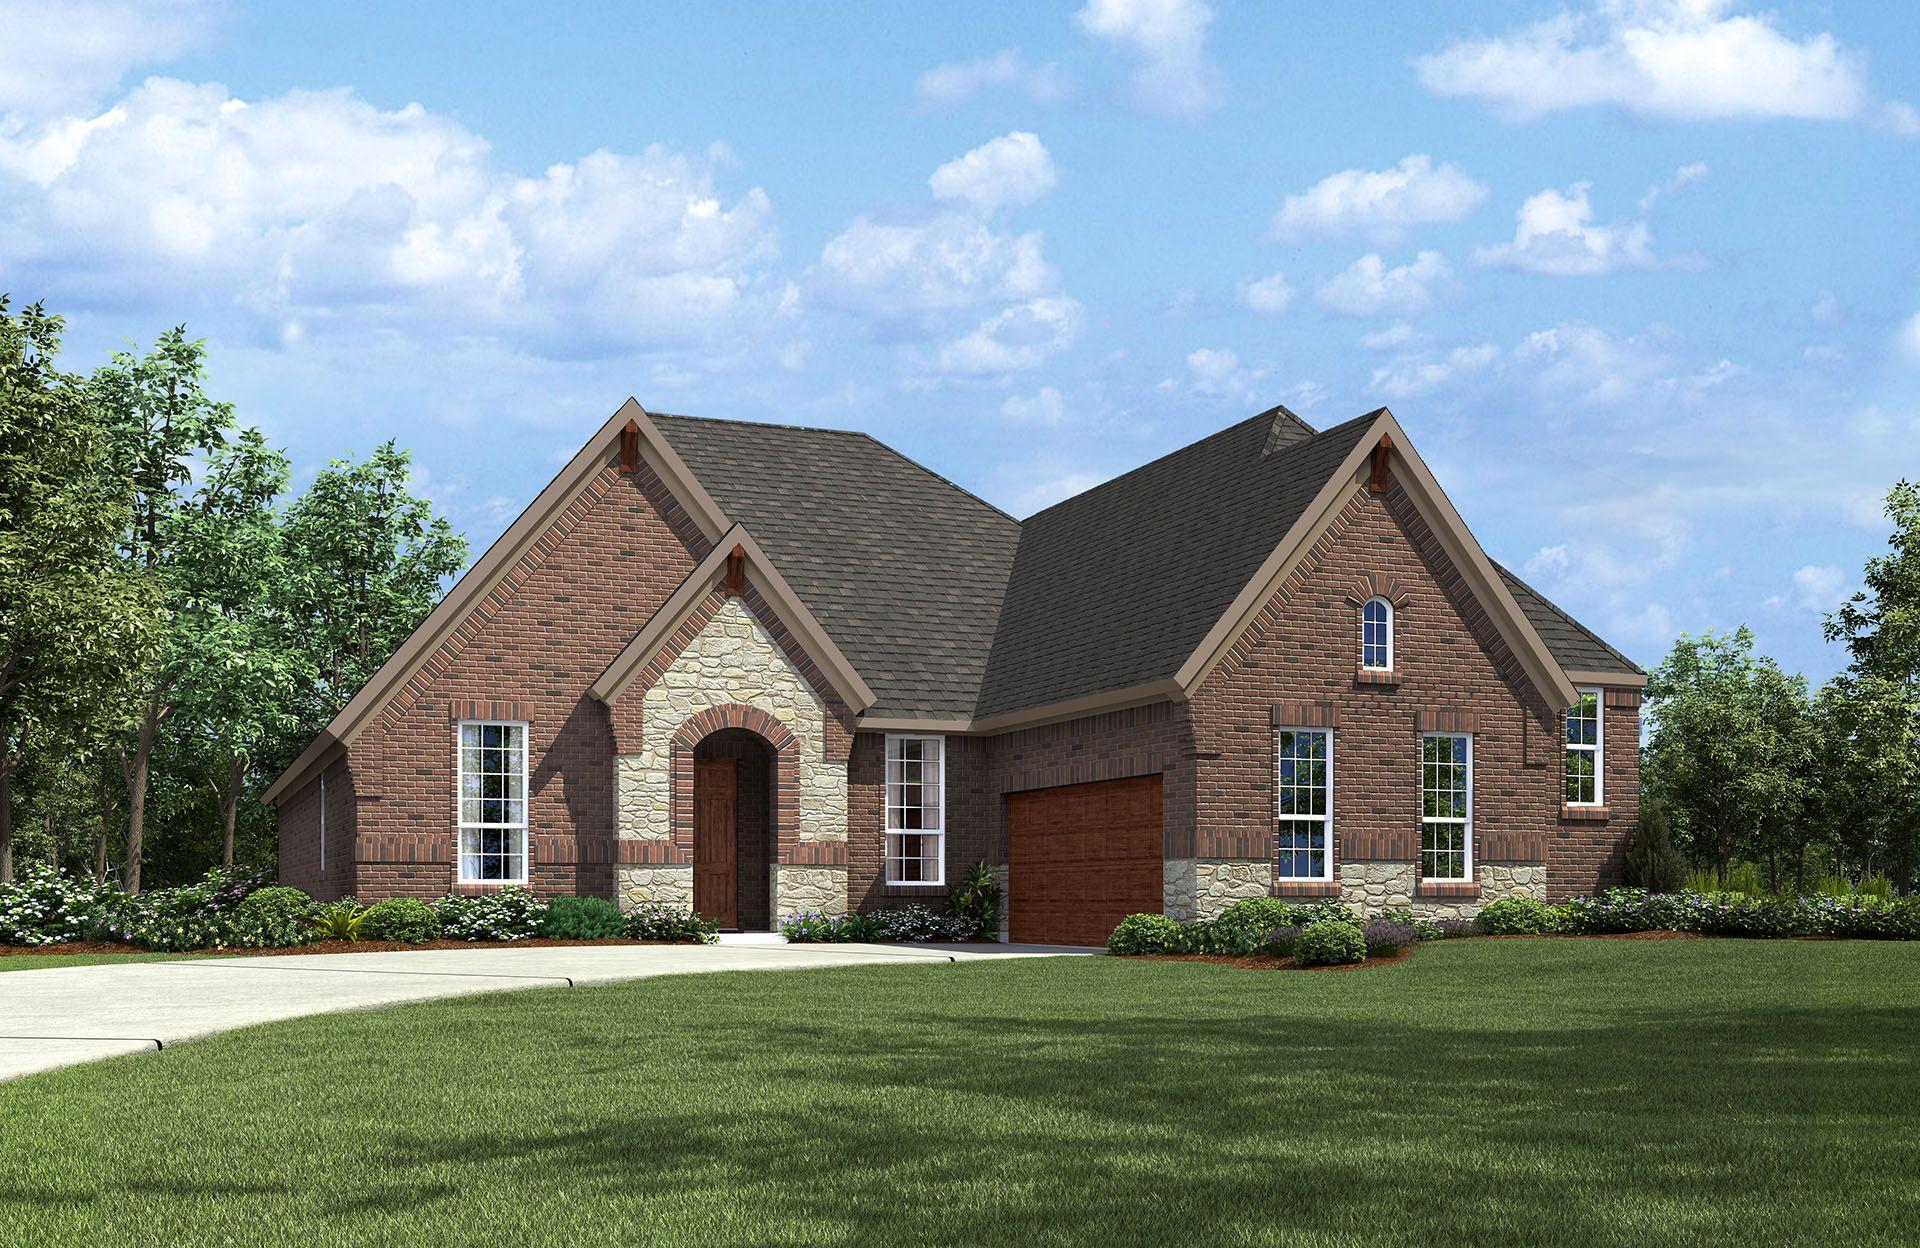 Single Family for Sale at Nine Oaks - Lorenzo Iii 611 Oak Grove Lane Coppell, Texas 75019 United States